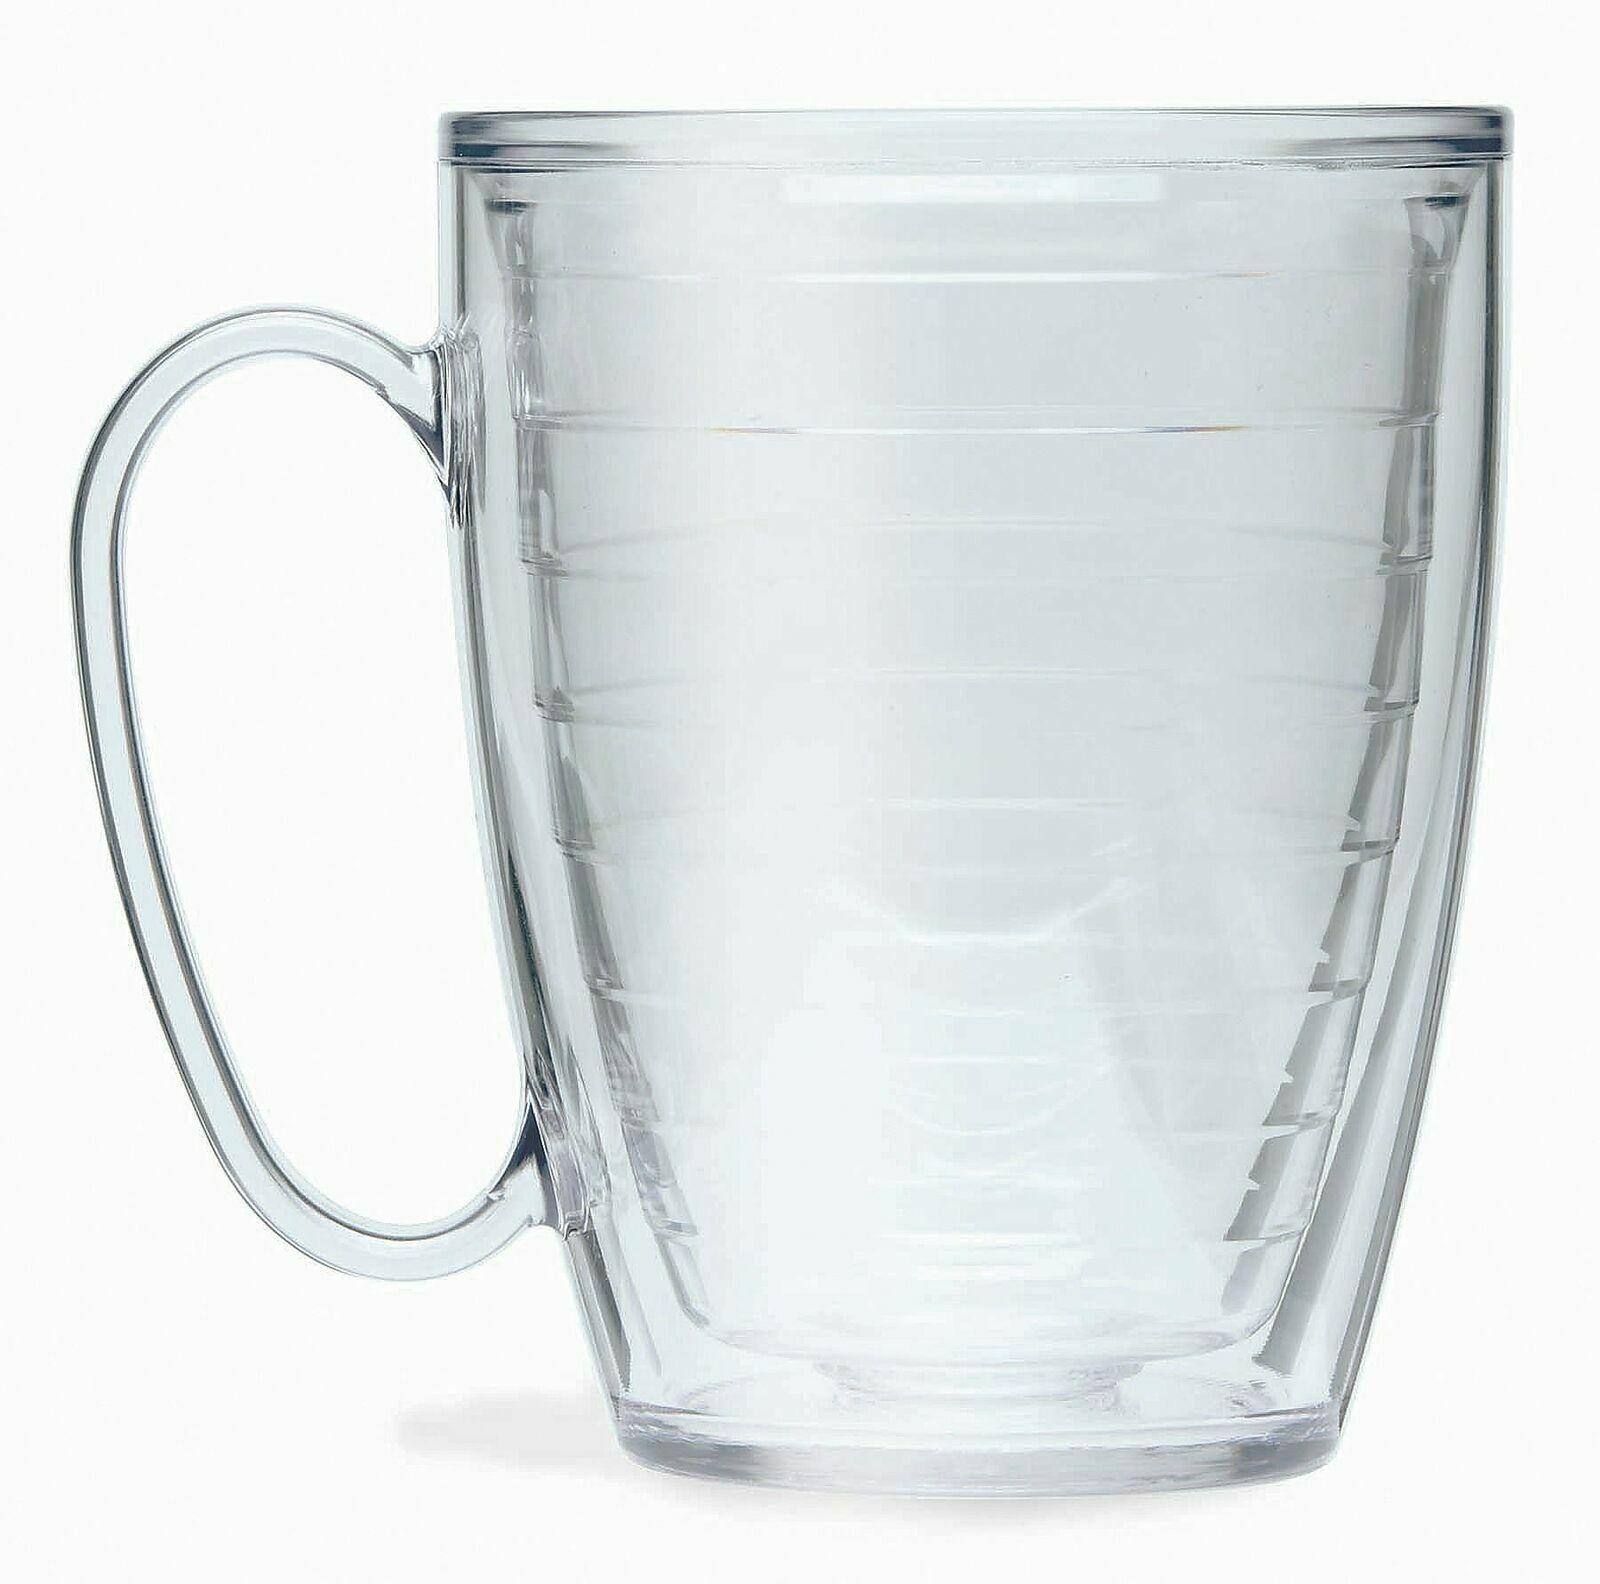 TERVIS Tumbler Clear 16 oz. MUG Coffee, Tea, Beer HOT or COL